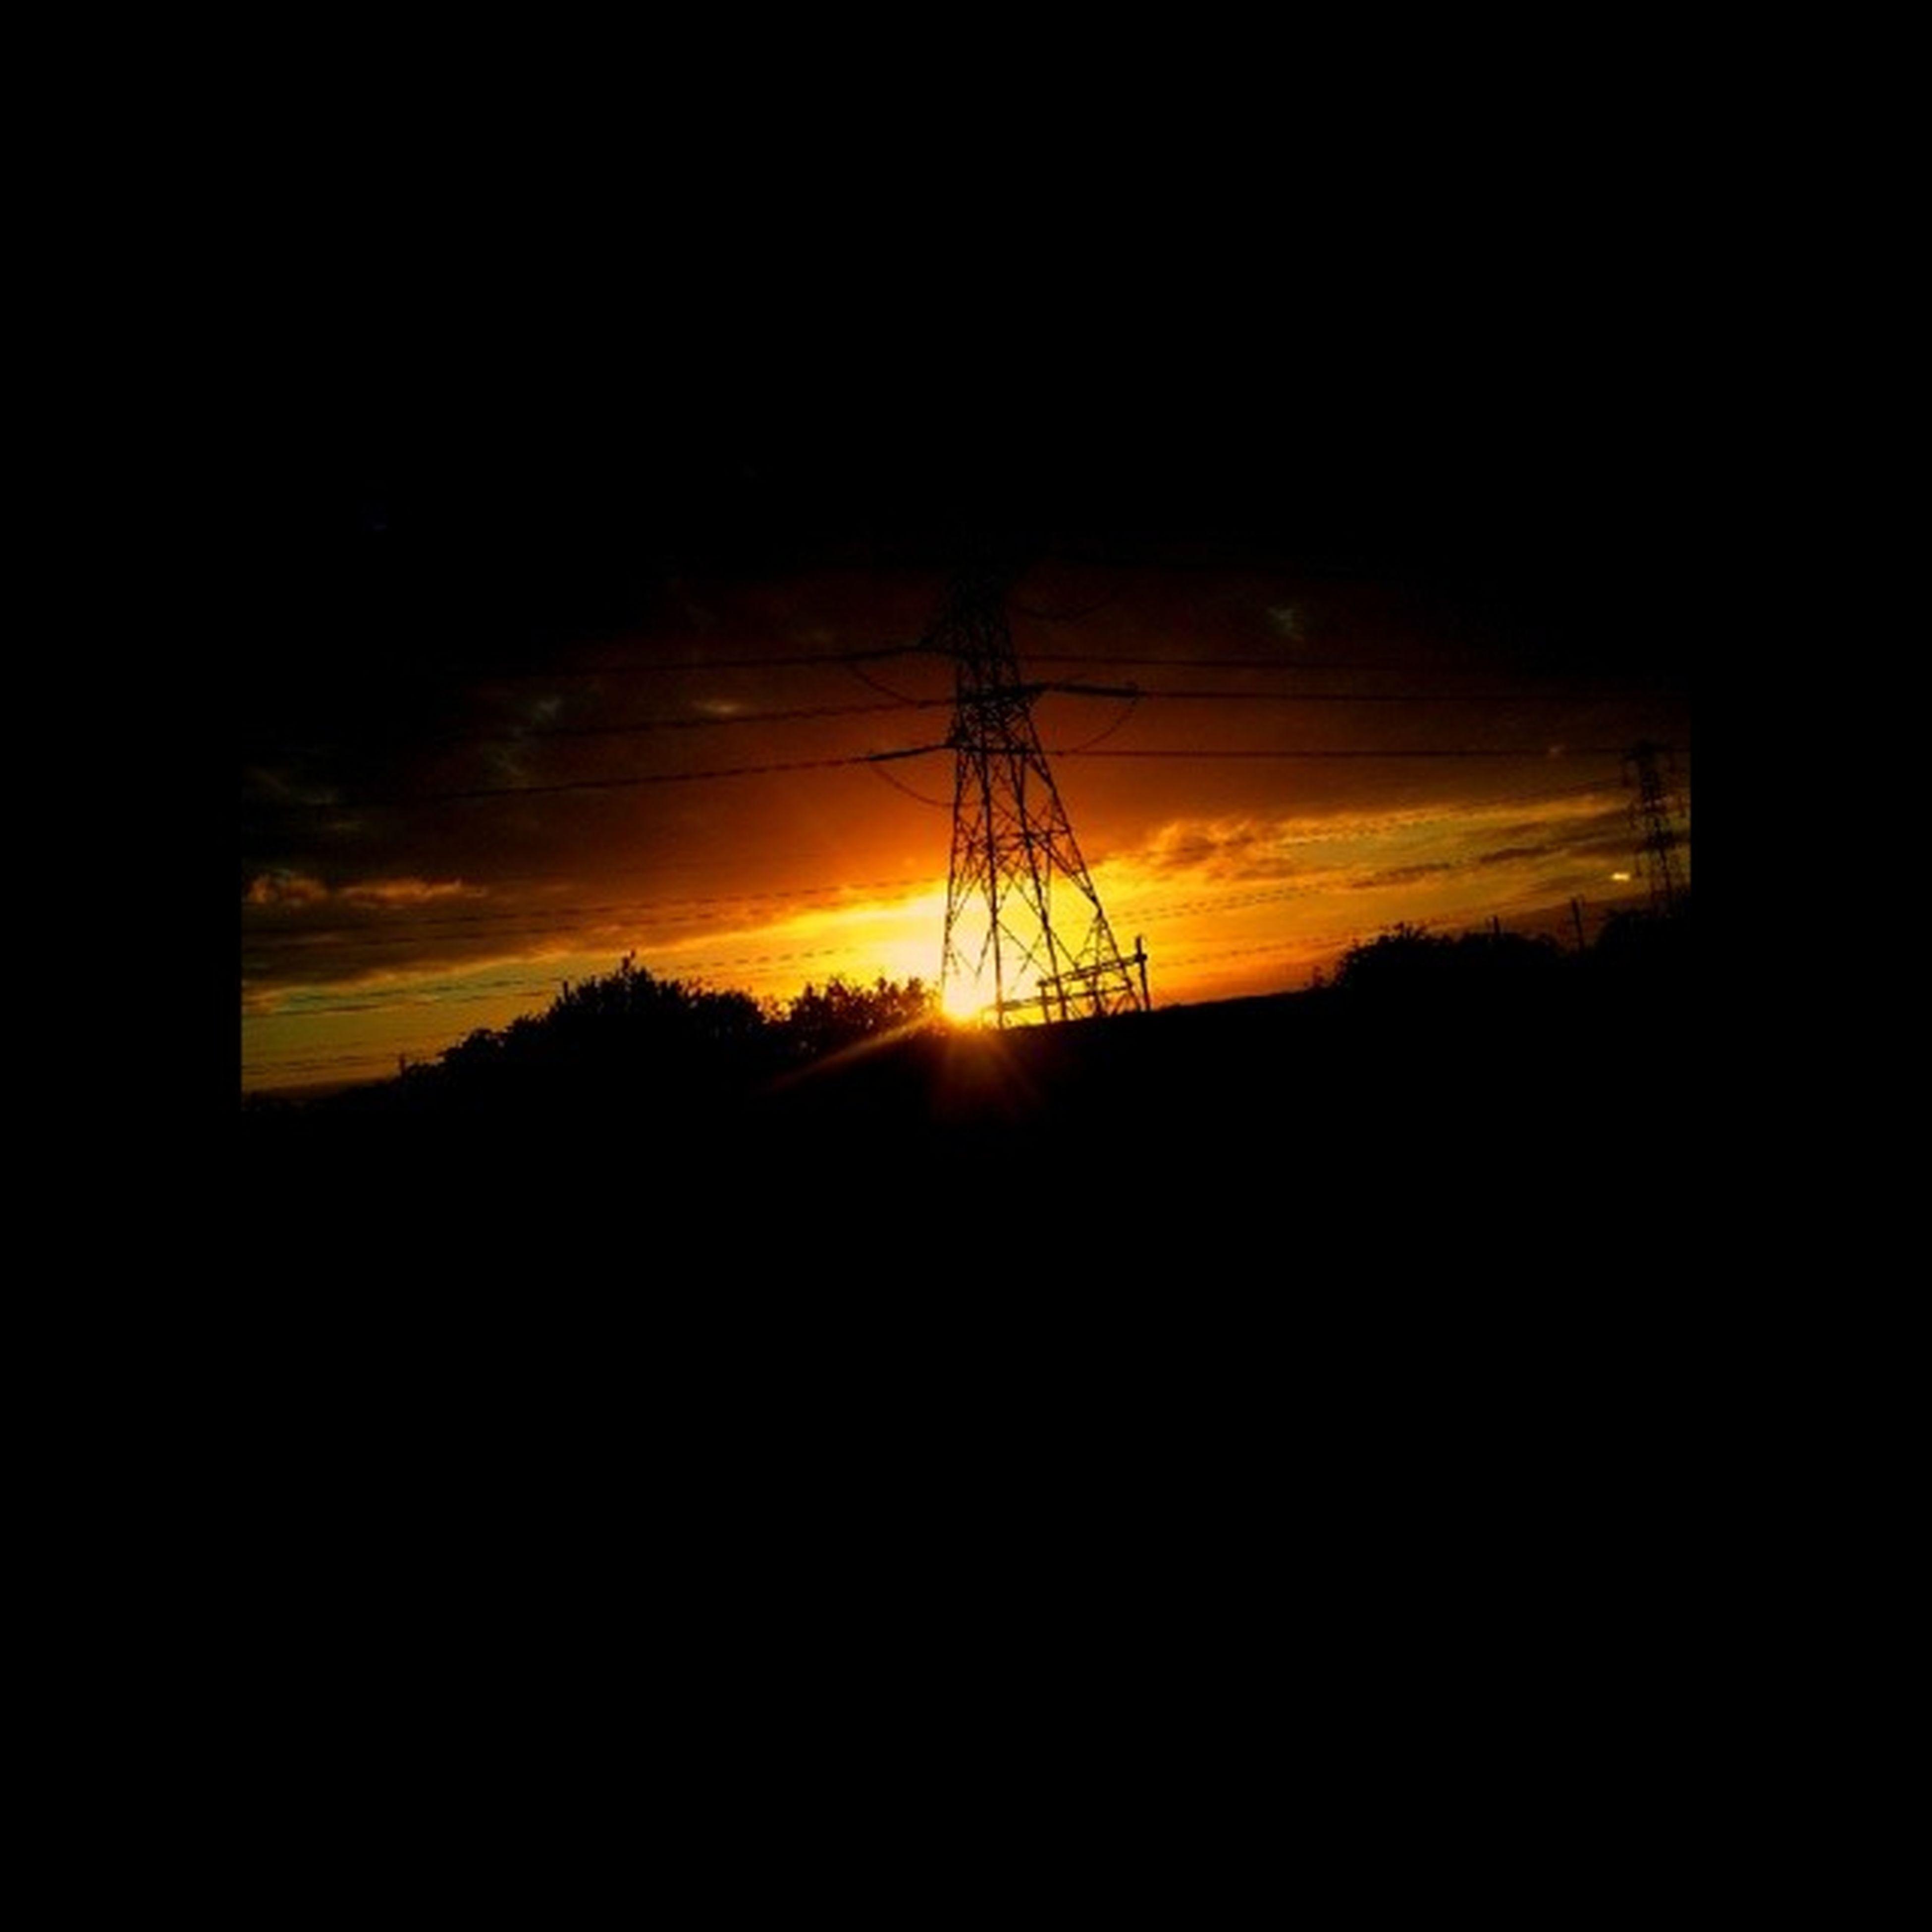 Central_sunset